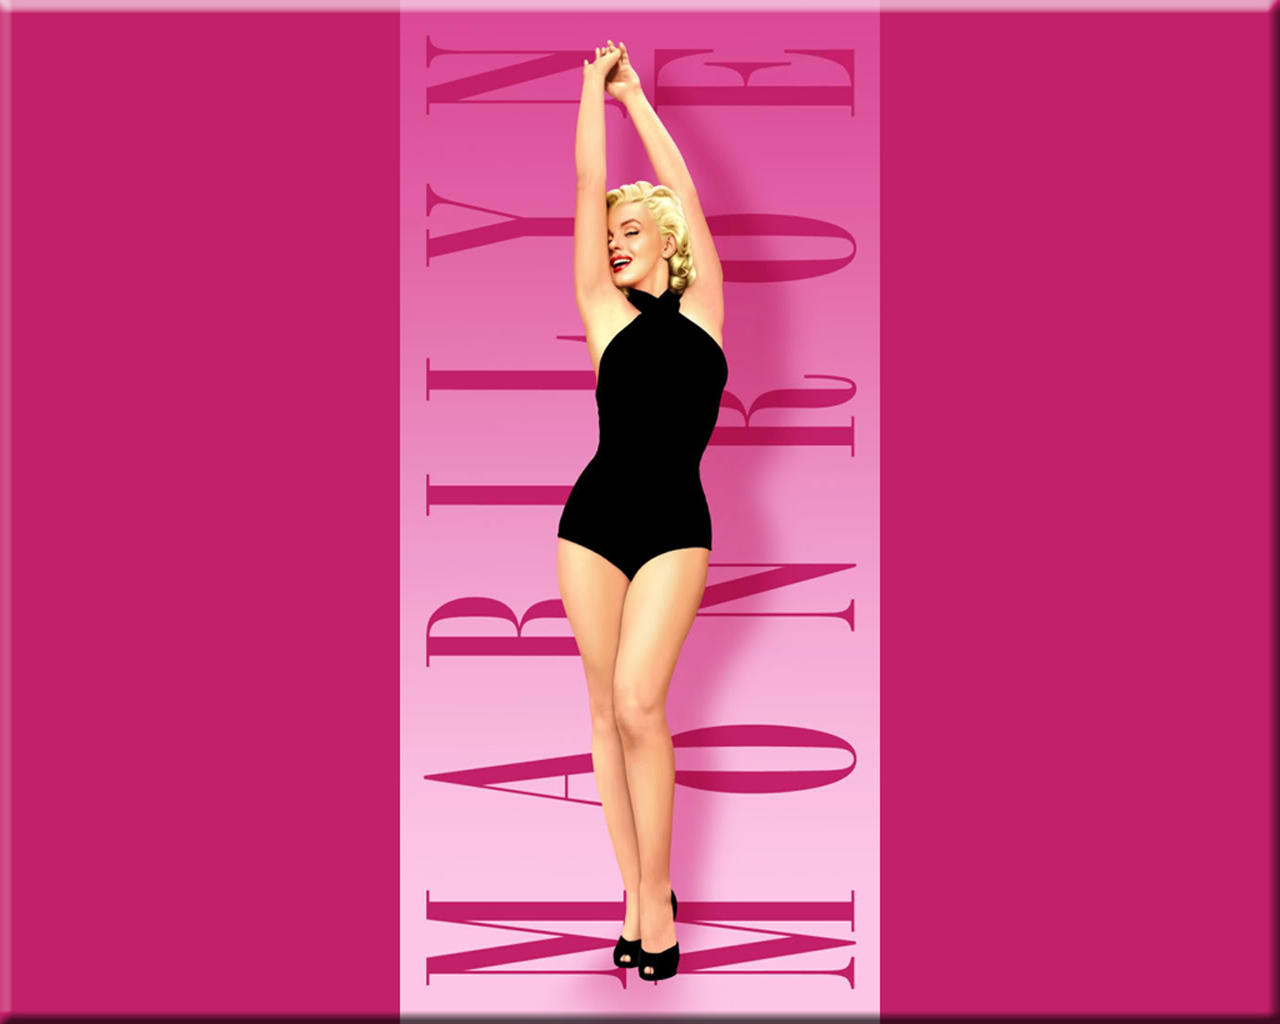 Cute Marilyn Monroe HD PicturesPhotos ImagesHigh Quality 1280x1024